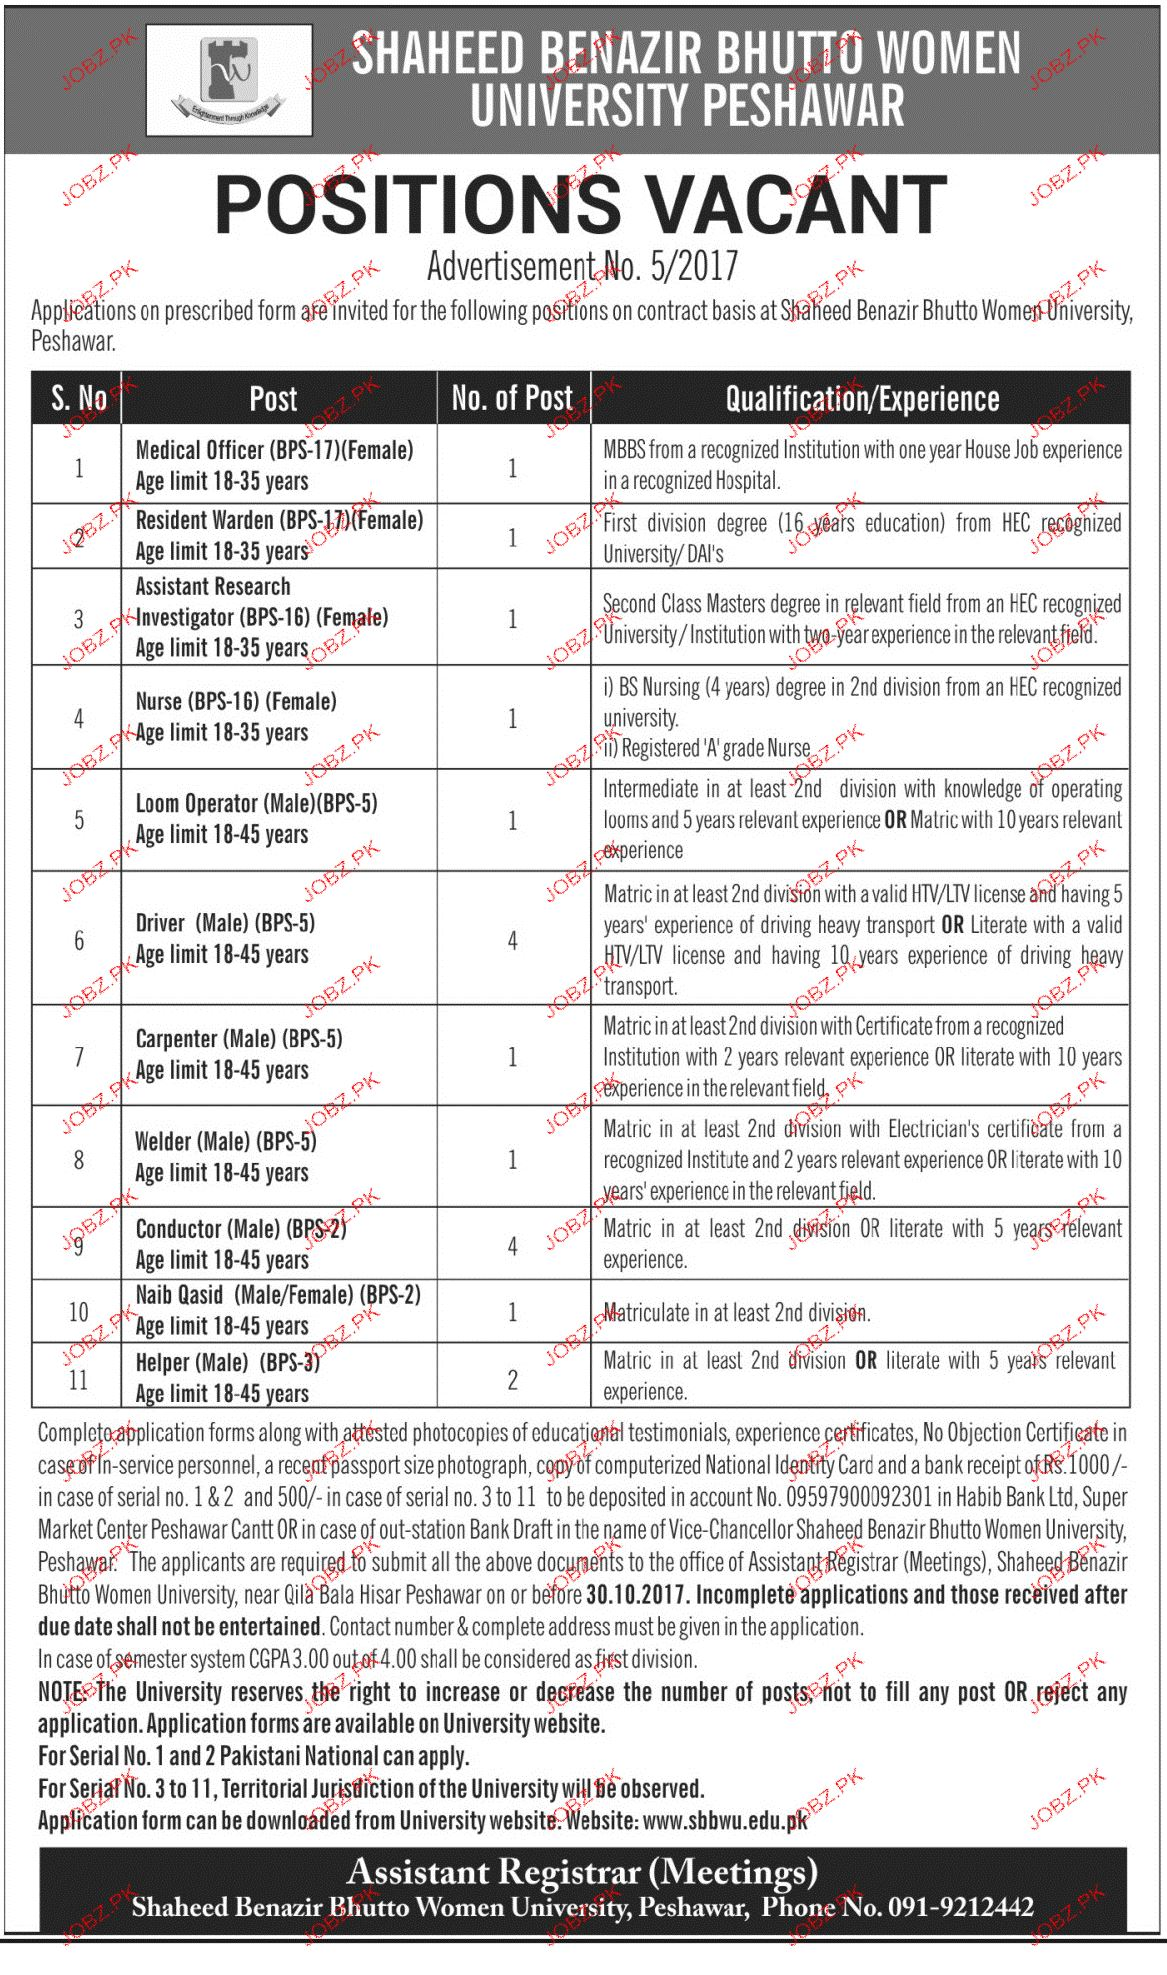 Shaheed Benazir Bhutto University Jobs Open